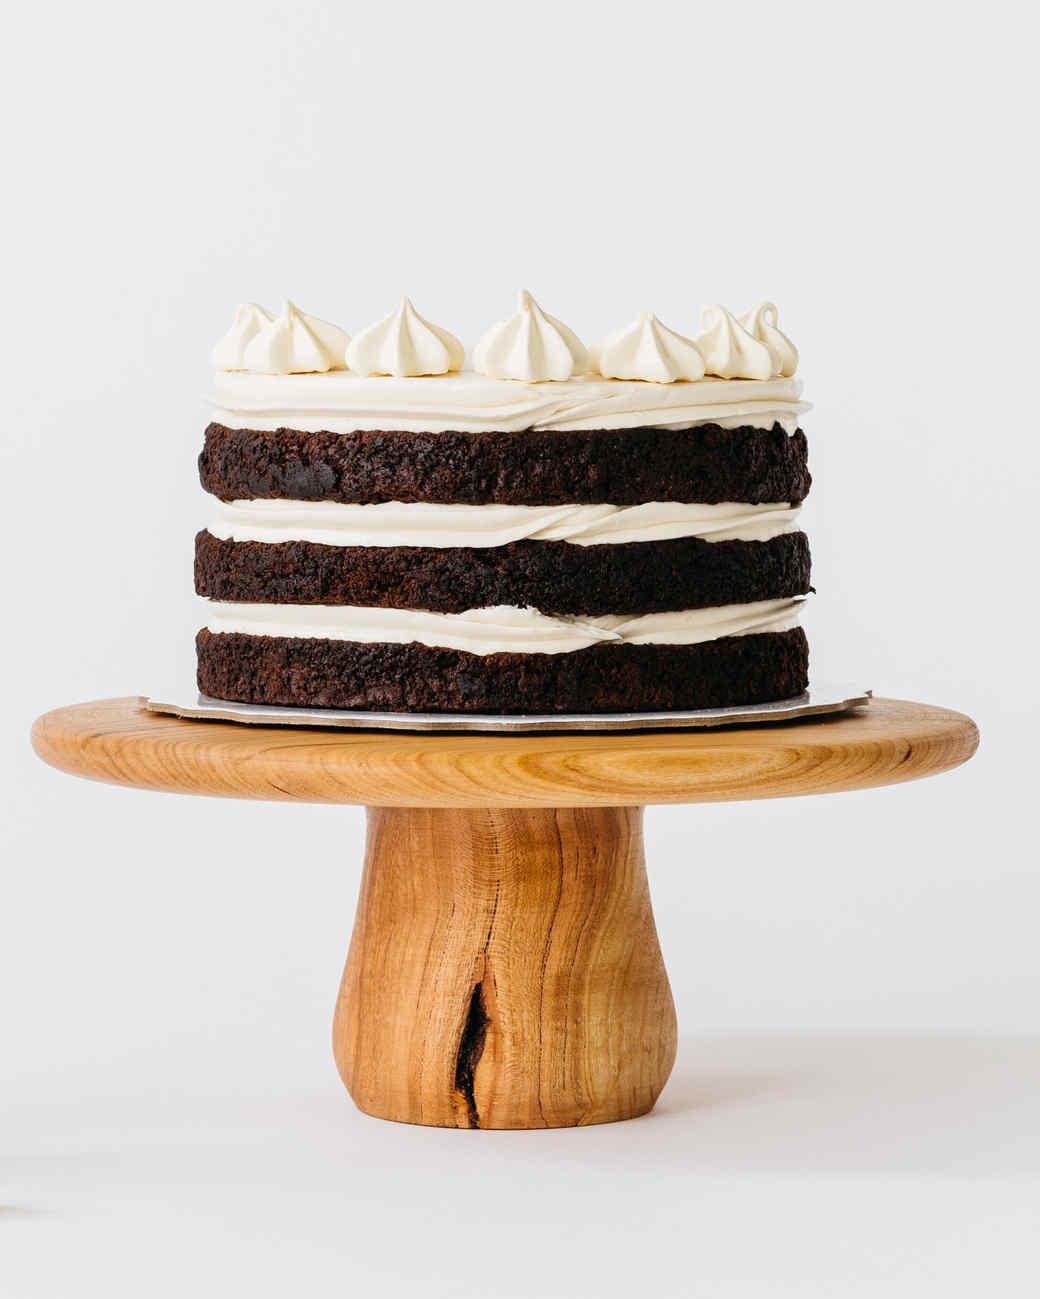 cake-stand-light-with-cake-brika-0517